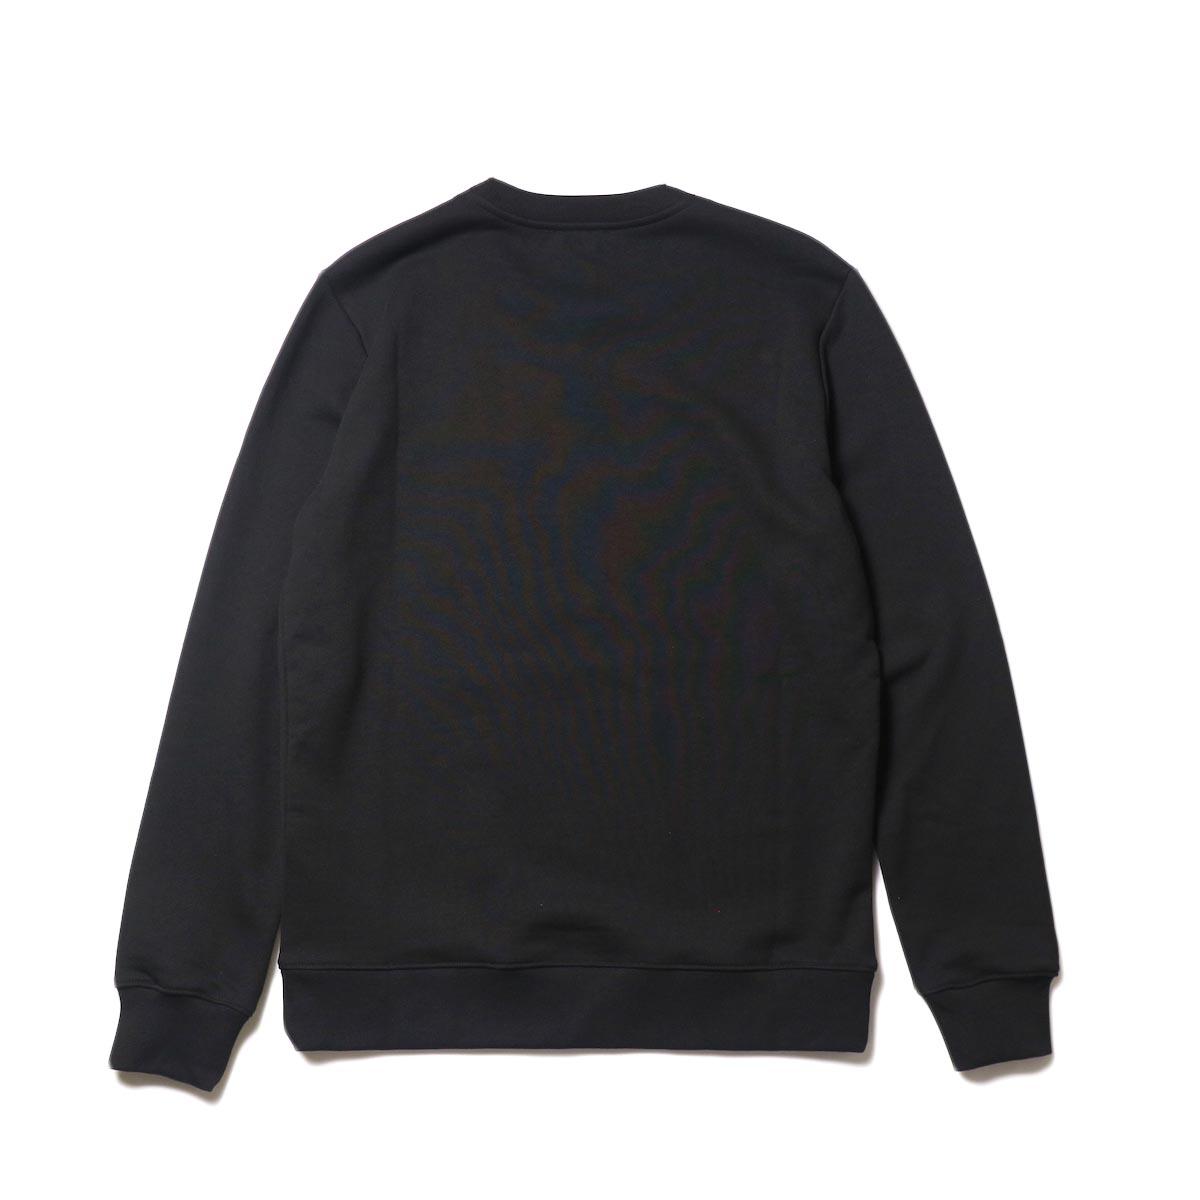 A.P.C. / VPC スウェットシャツ (black) 背面